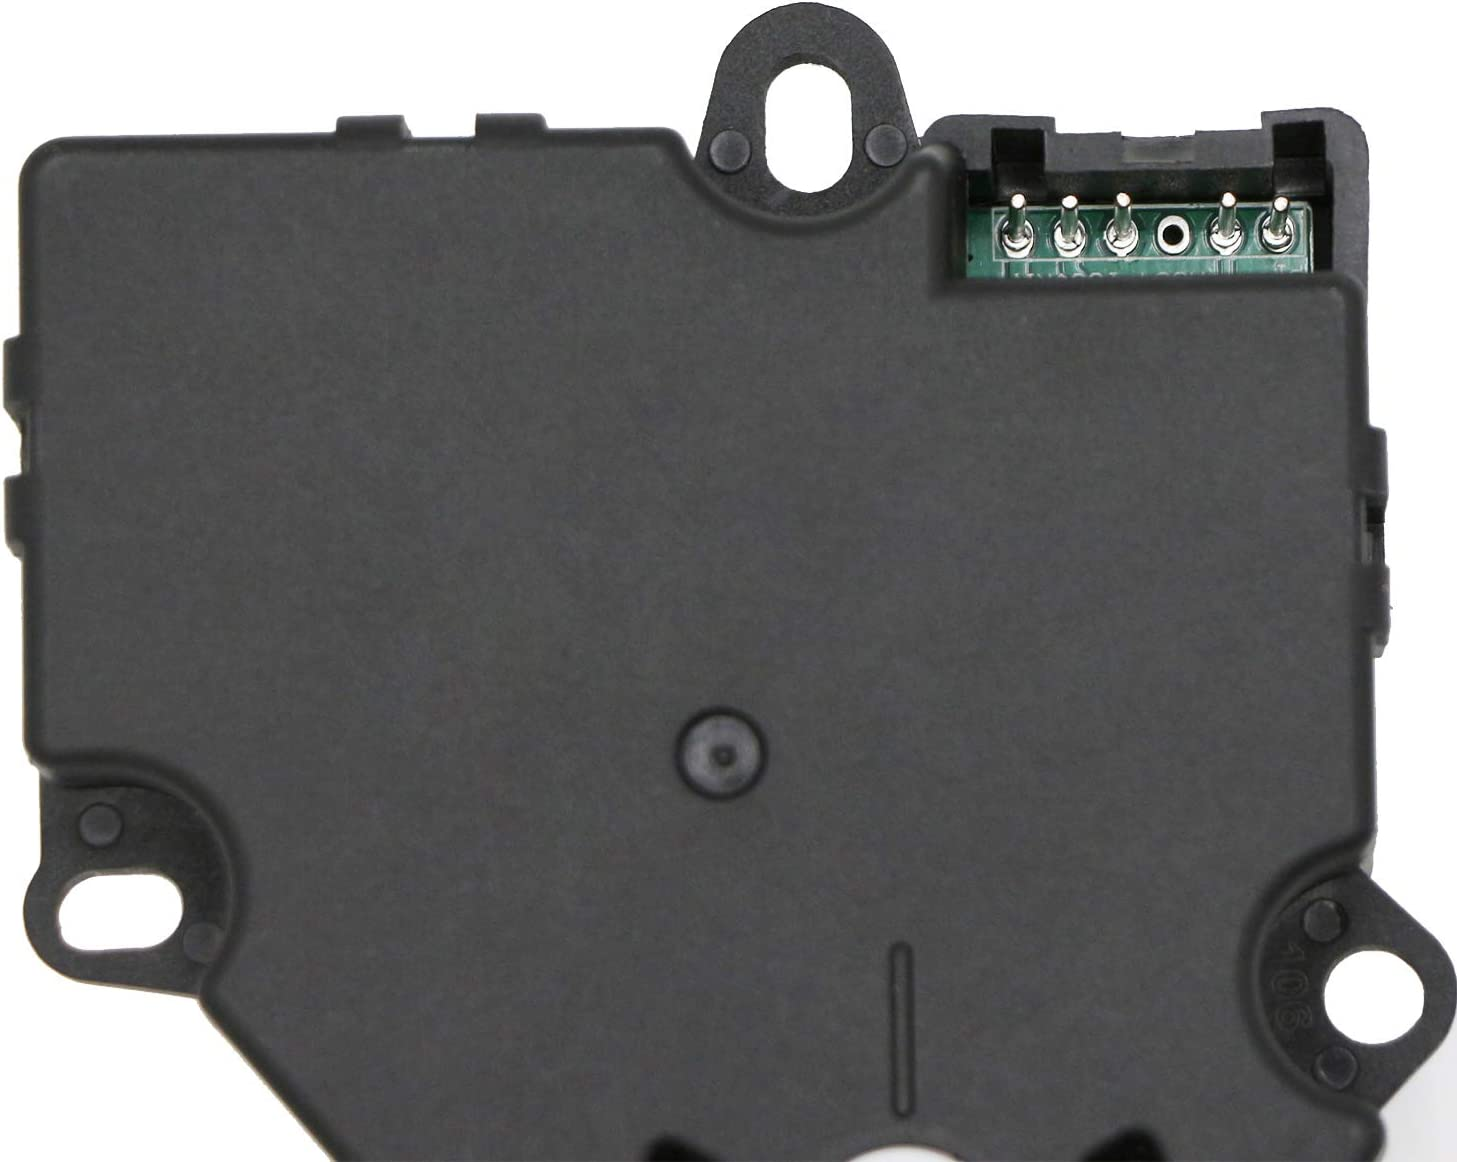 Fits Chevy Silverado 1500 Silverado 2500 HD Tahoe HVAC Blend Control Act GMC Sierra 1500 99 00 01 02 03 04 05 06 07 08 09 10 11 12 13 Replaces# 89018365 52402588 Blend Door Actuator 604-106